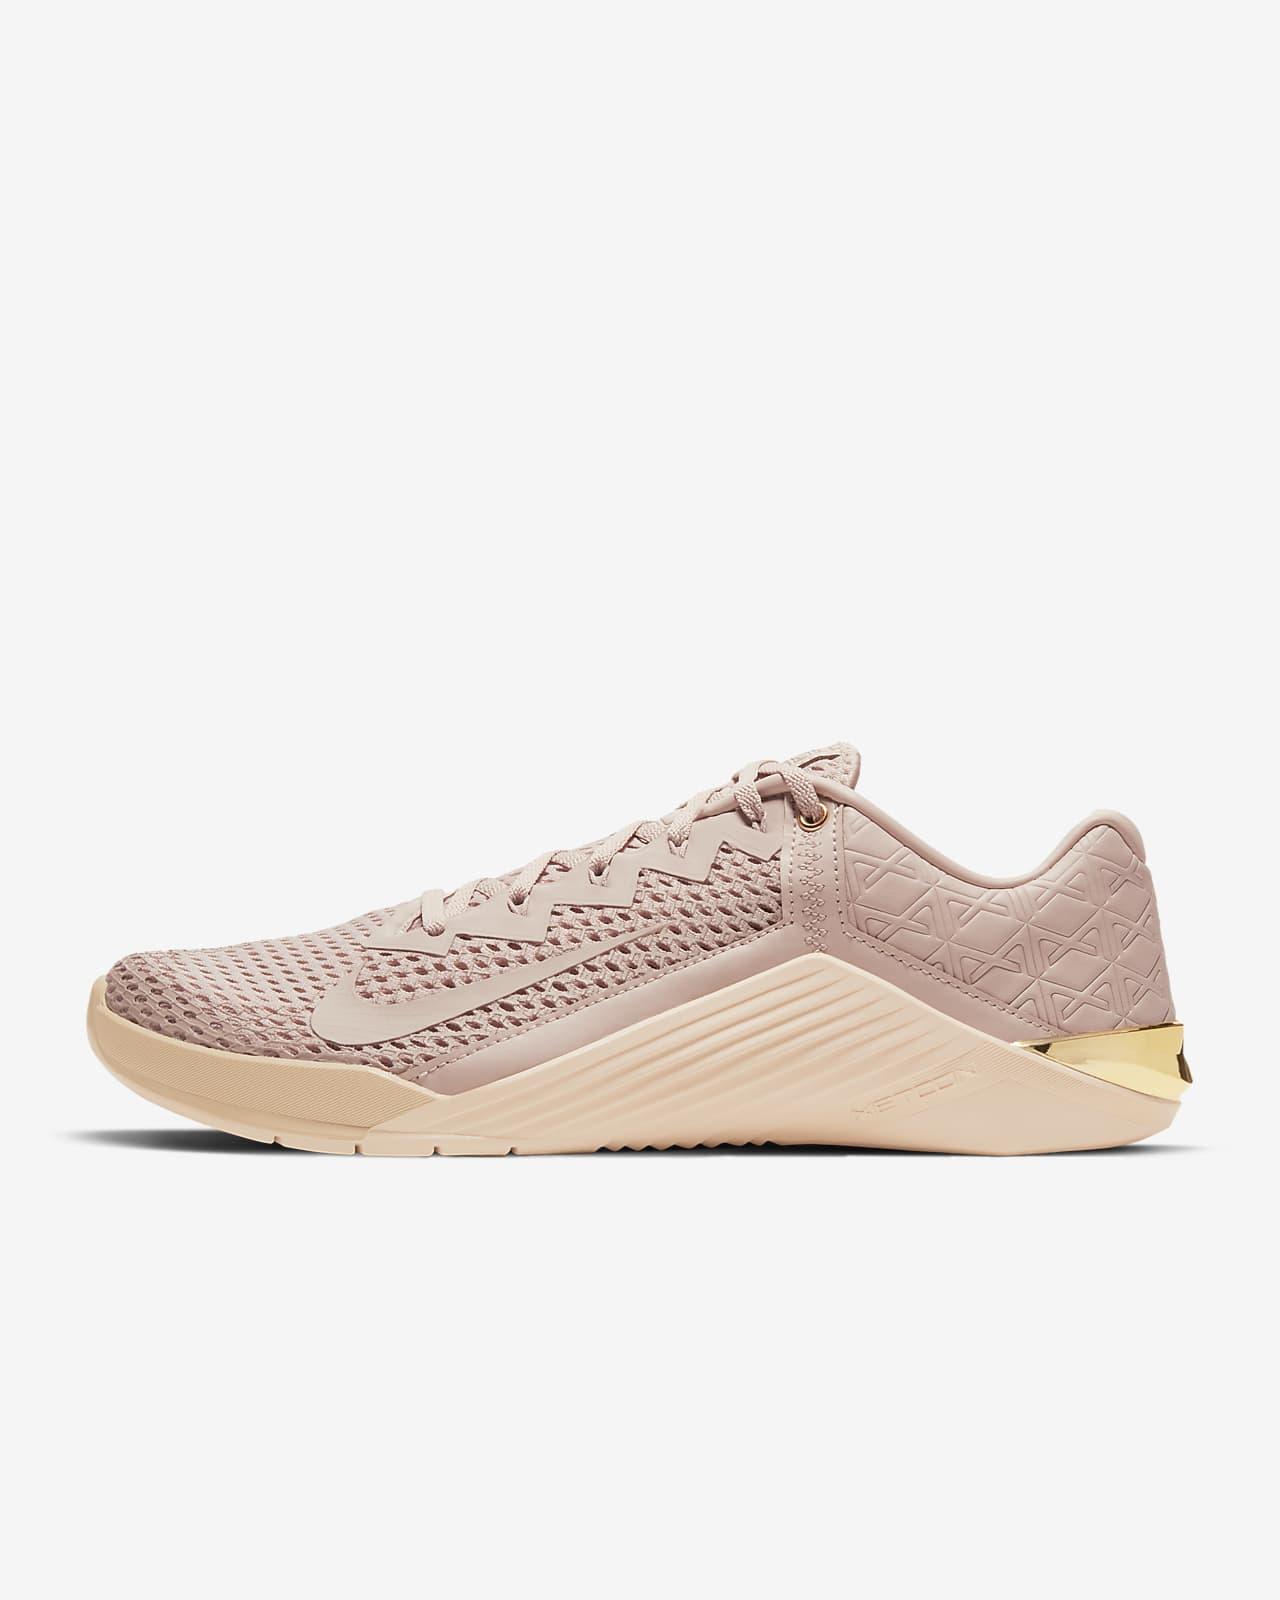 Tréninková bota Nike Metcon6 Premium